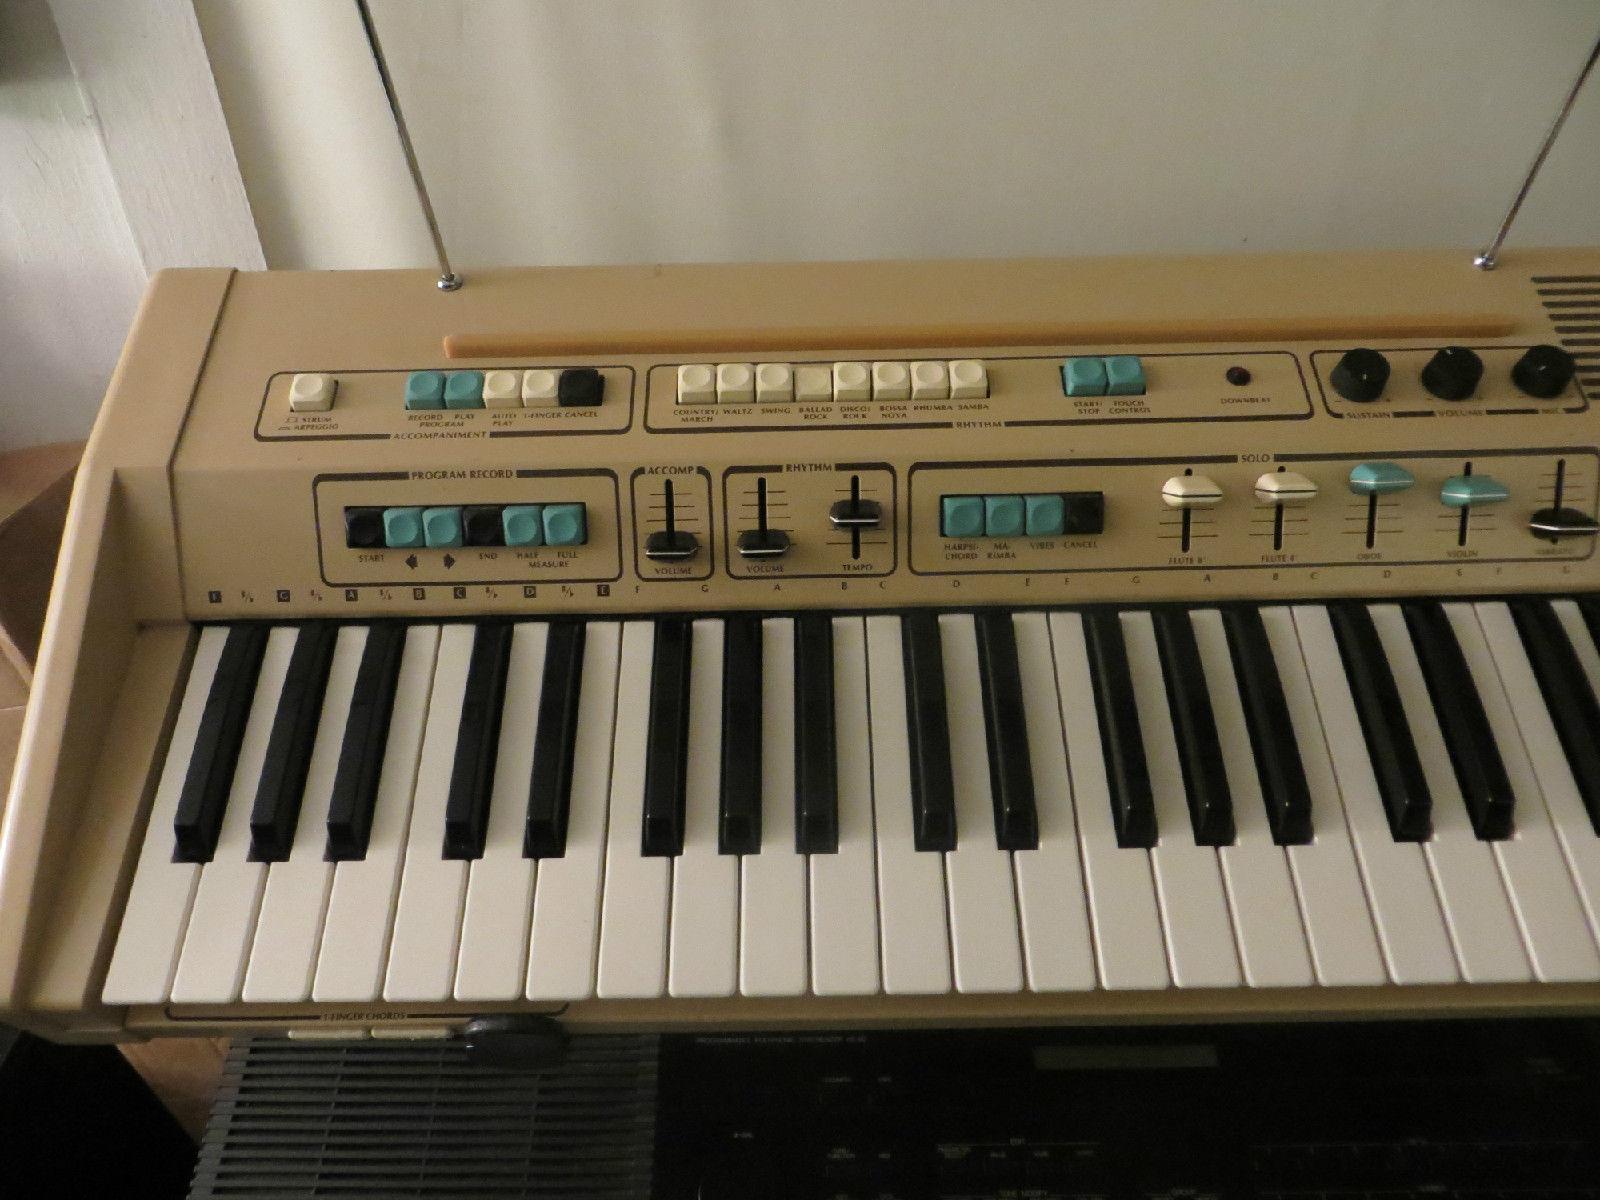 matrixsynth vintage baldwin dicoverer organ with drum machine ds 50 analog portable keyboard. Black Bedroom Furniture Sets. Home Design Ideas